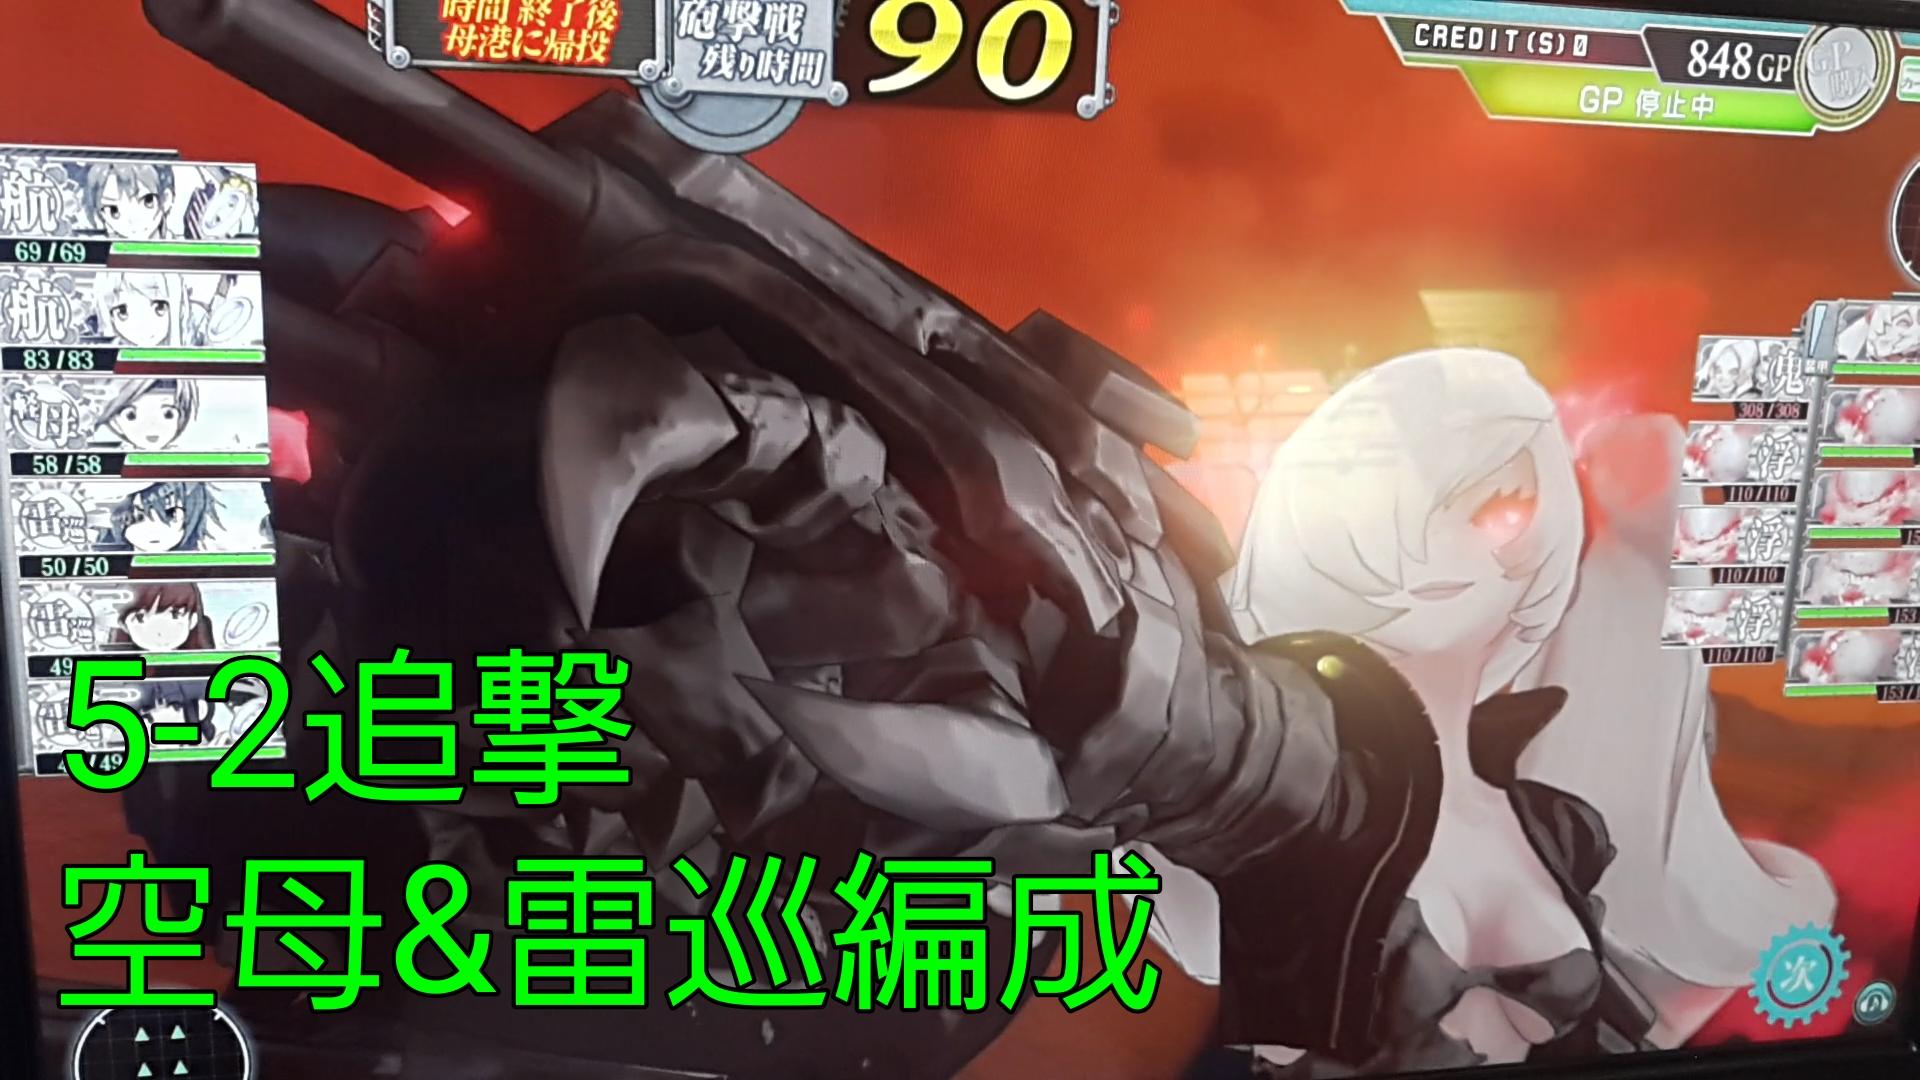 【AC】珊瑚諸島沖海戦(5-2追撃) 雷巡3空母2軽母1 プレイ動画